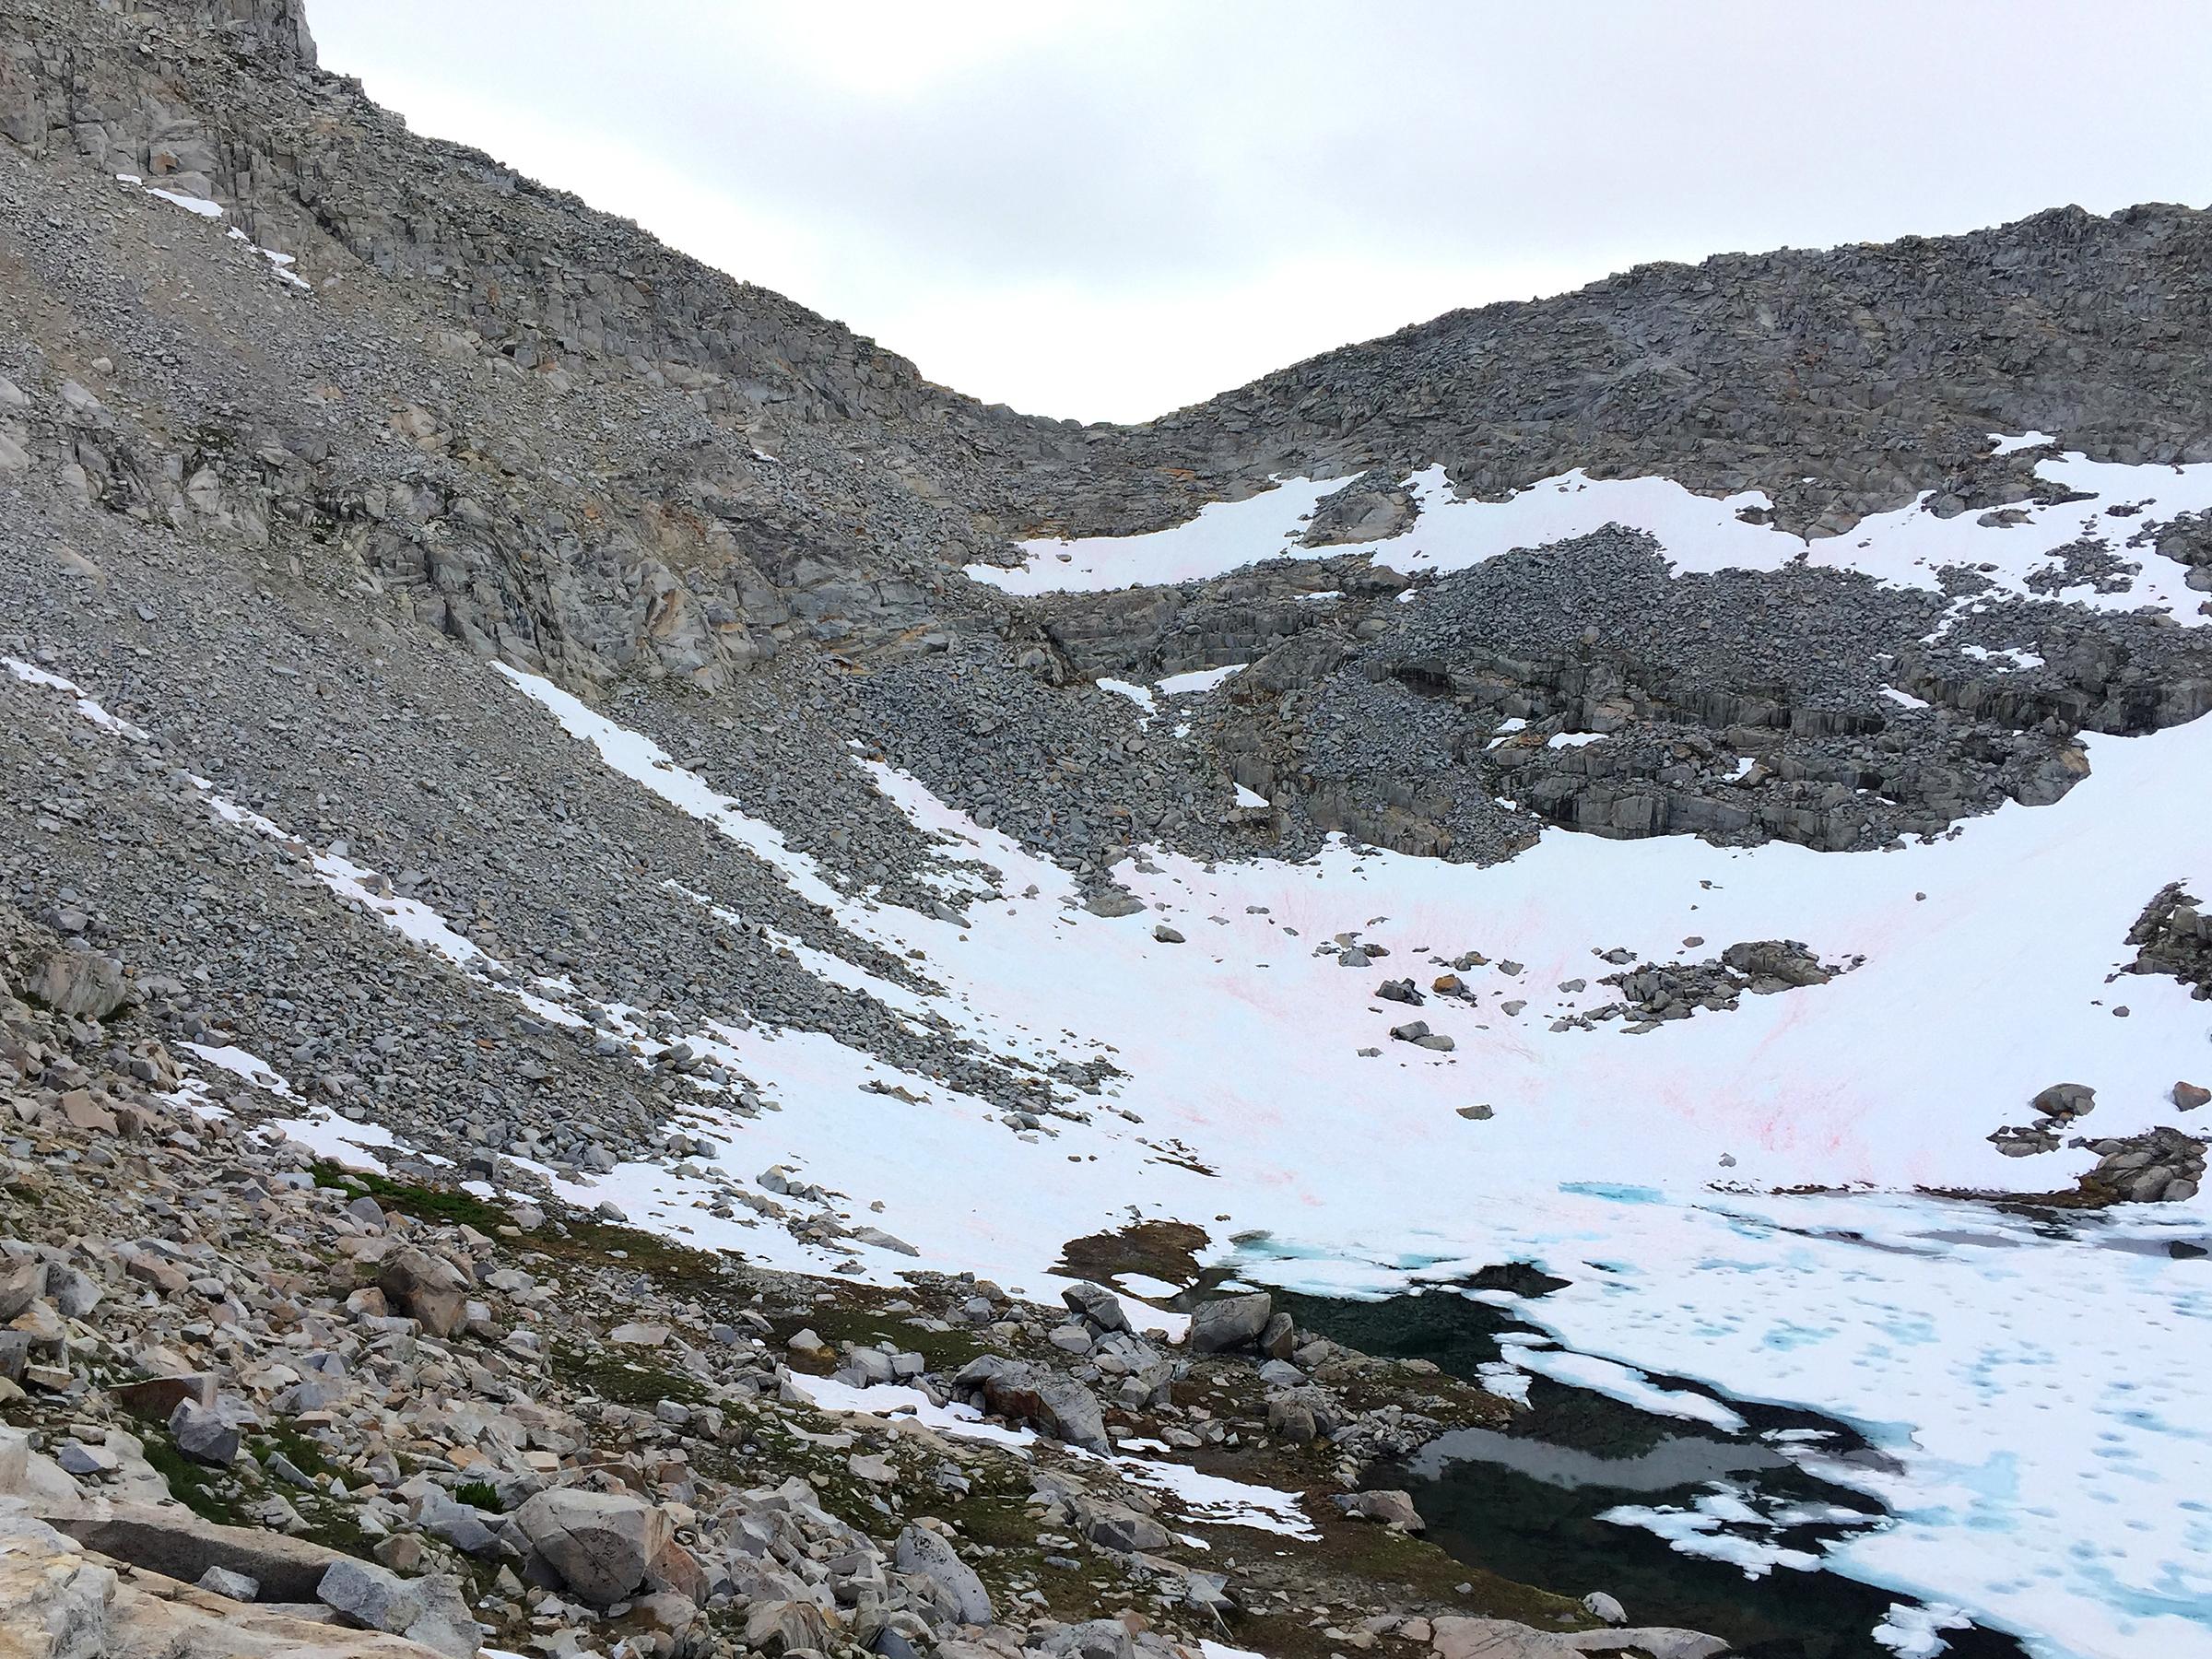 trailname-backstroke-sierra-high-route-2017_blue lake pass-_0145.jpg